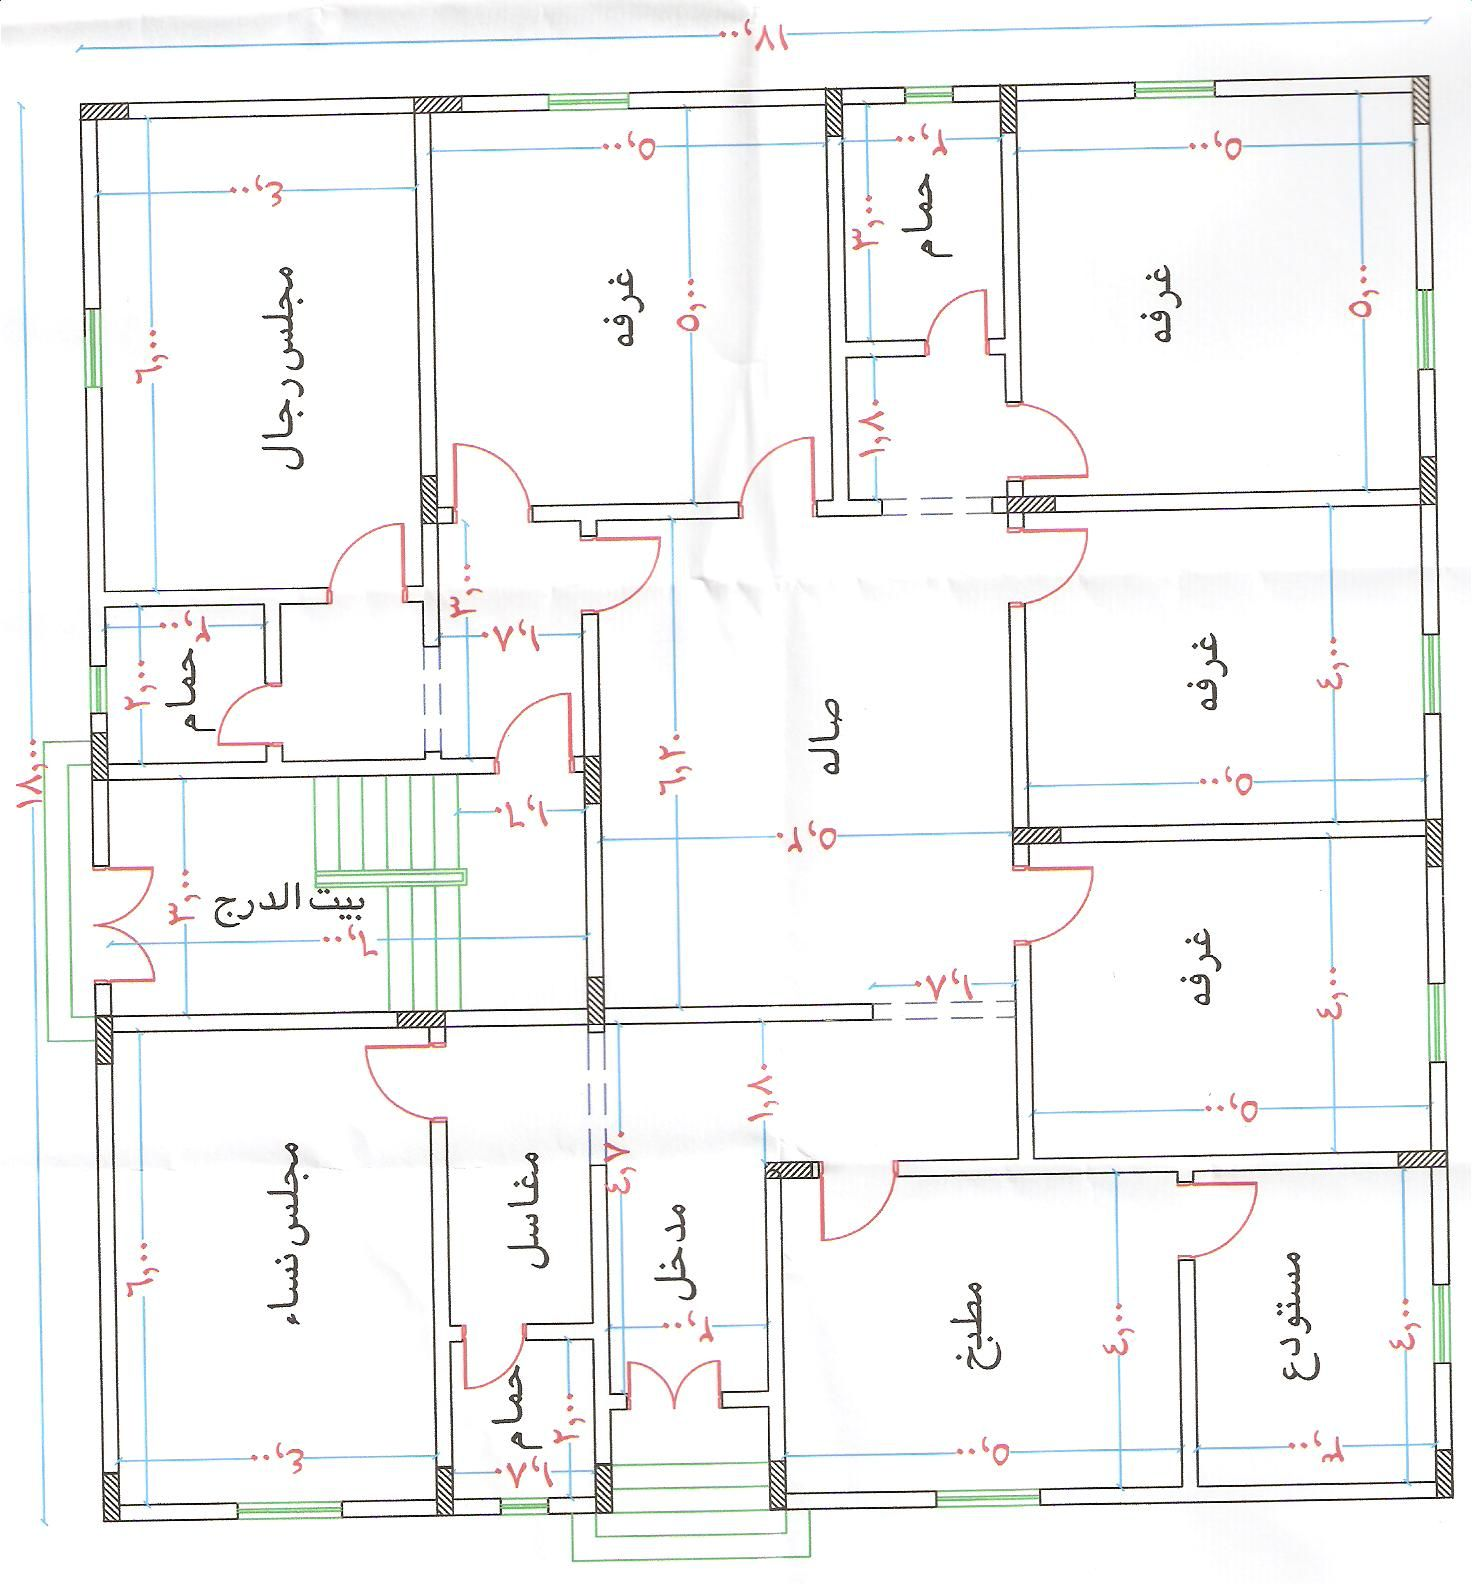 floor plans diagram home decor  [ 1472 x 1584 Pixel ]